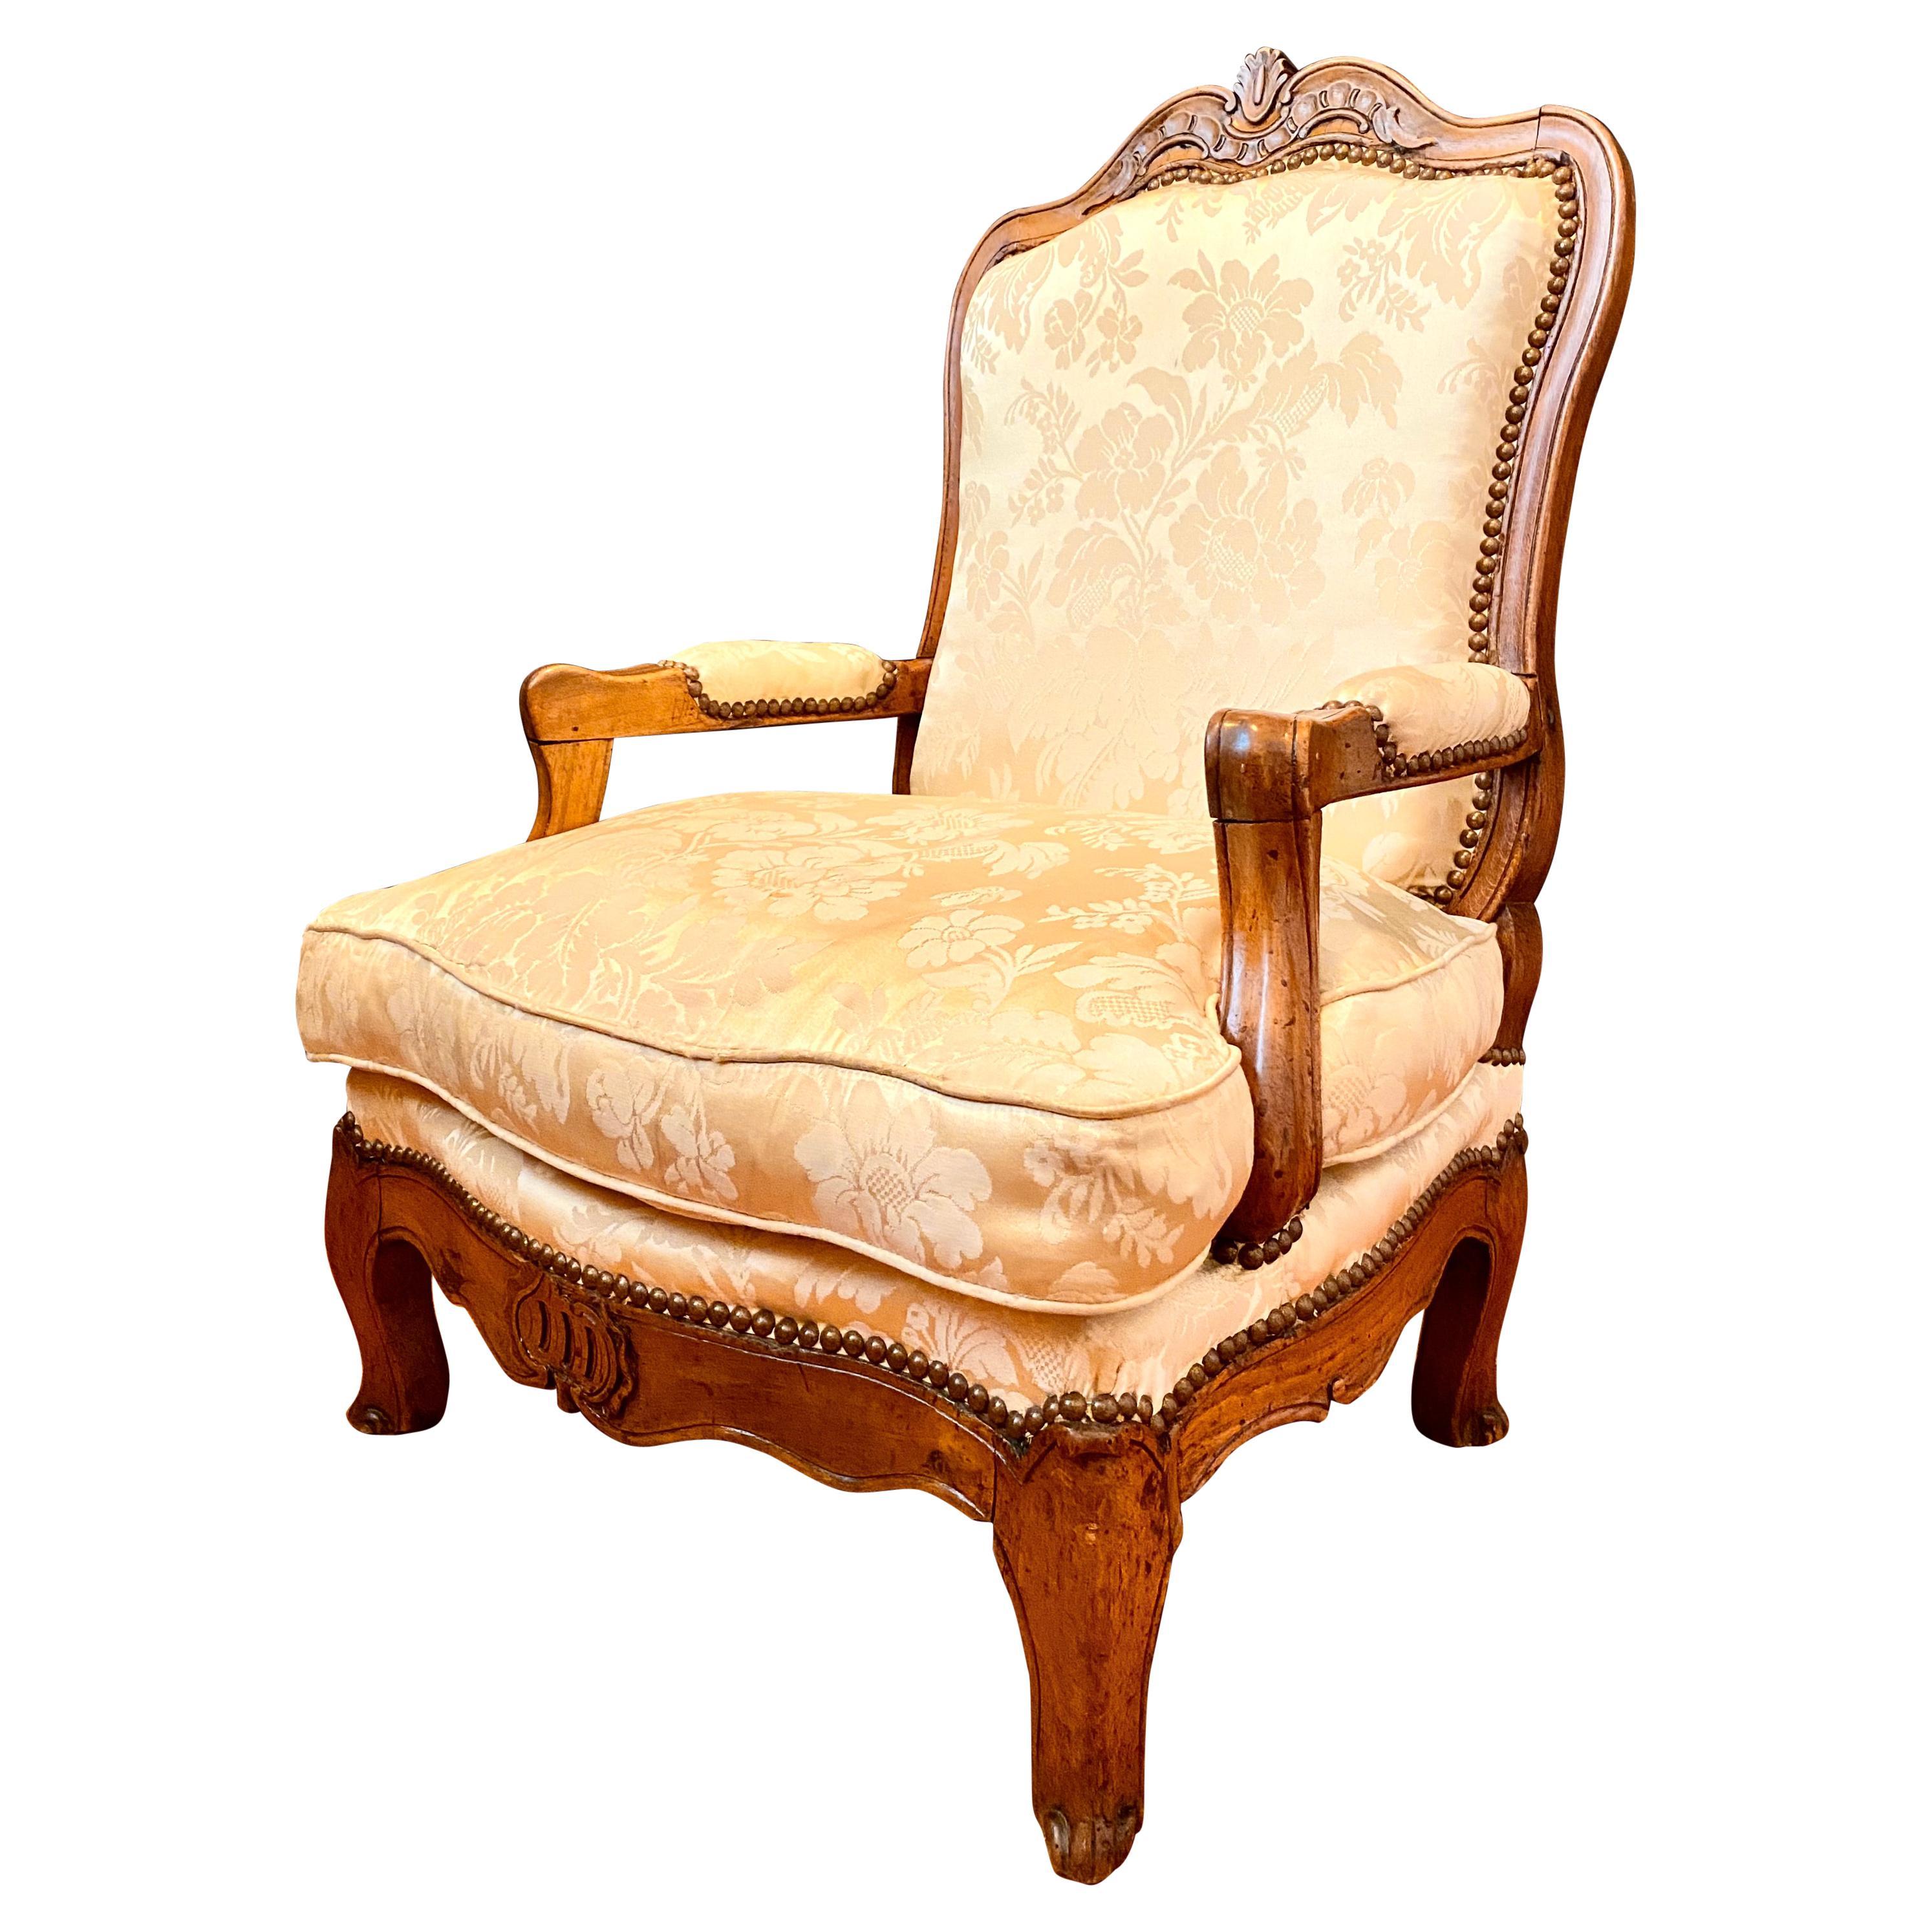 French Low Armchair, Louis XV Provençal, Fireside Armchair